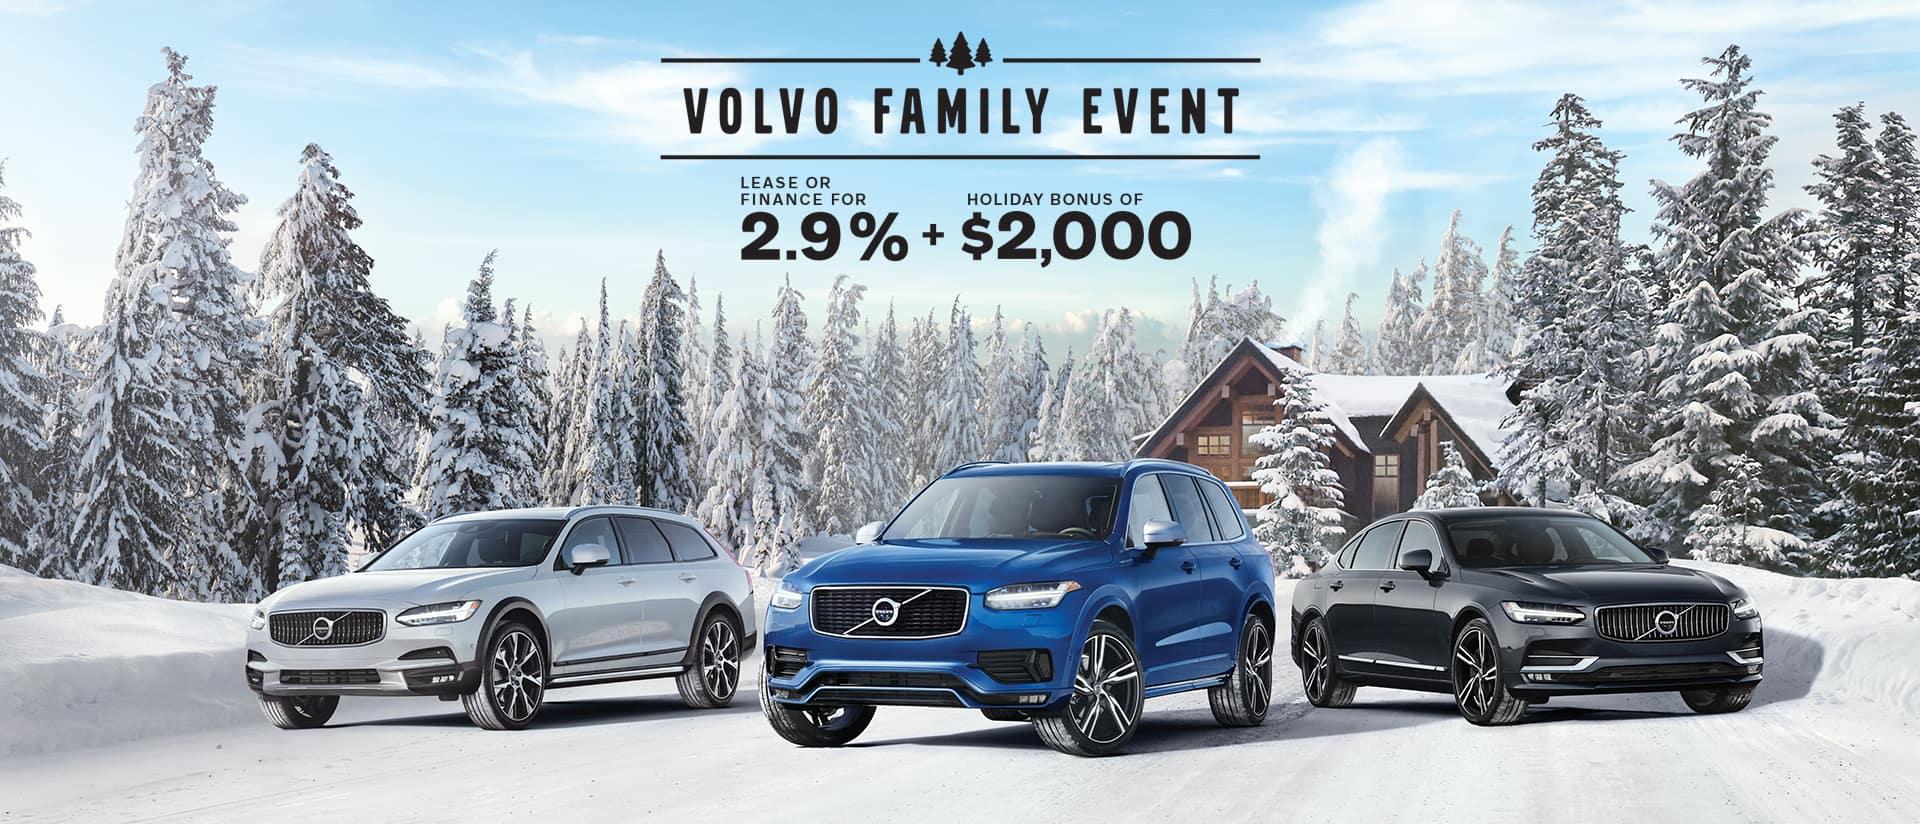 Volvo Family Event